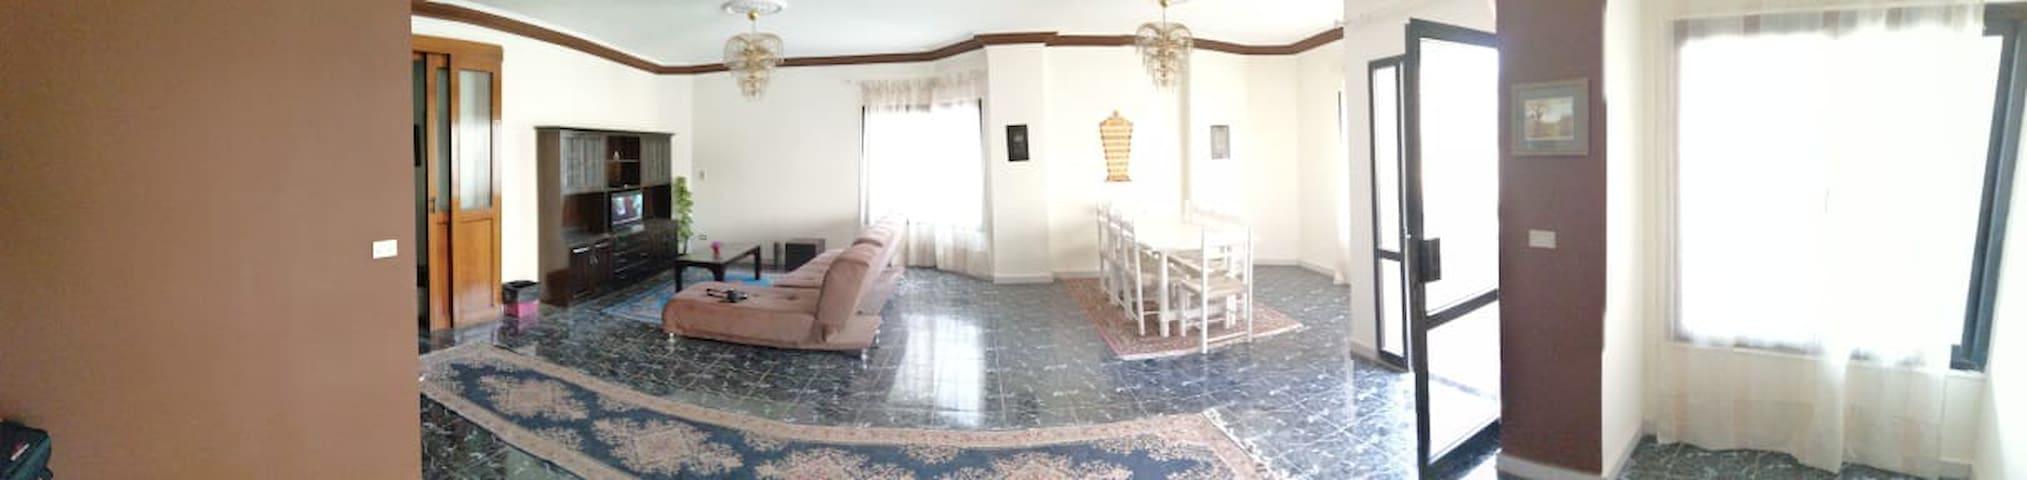 privet double room near genena mall